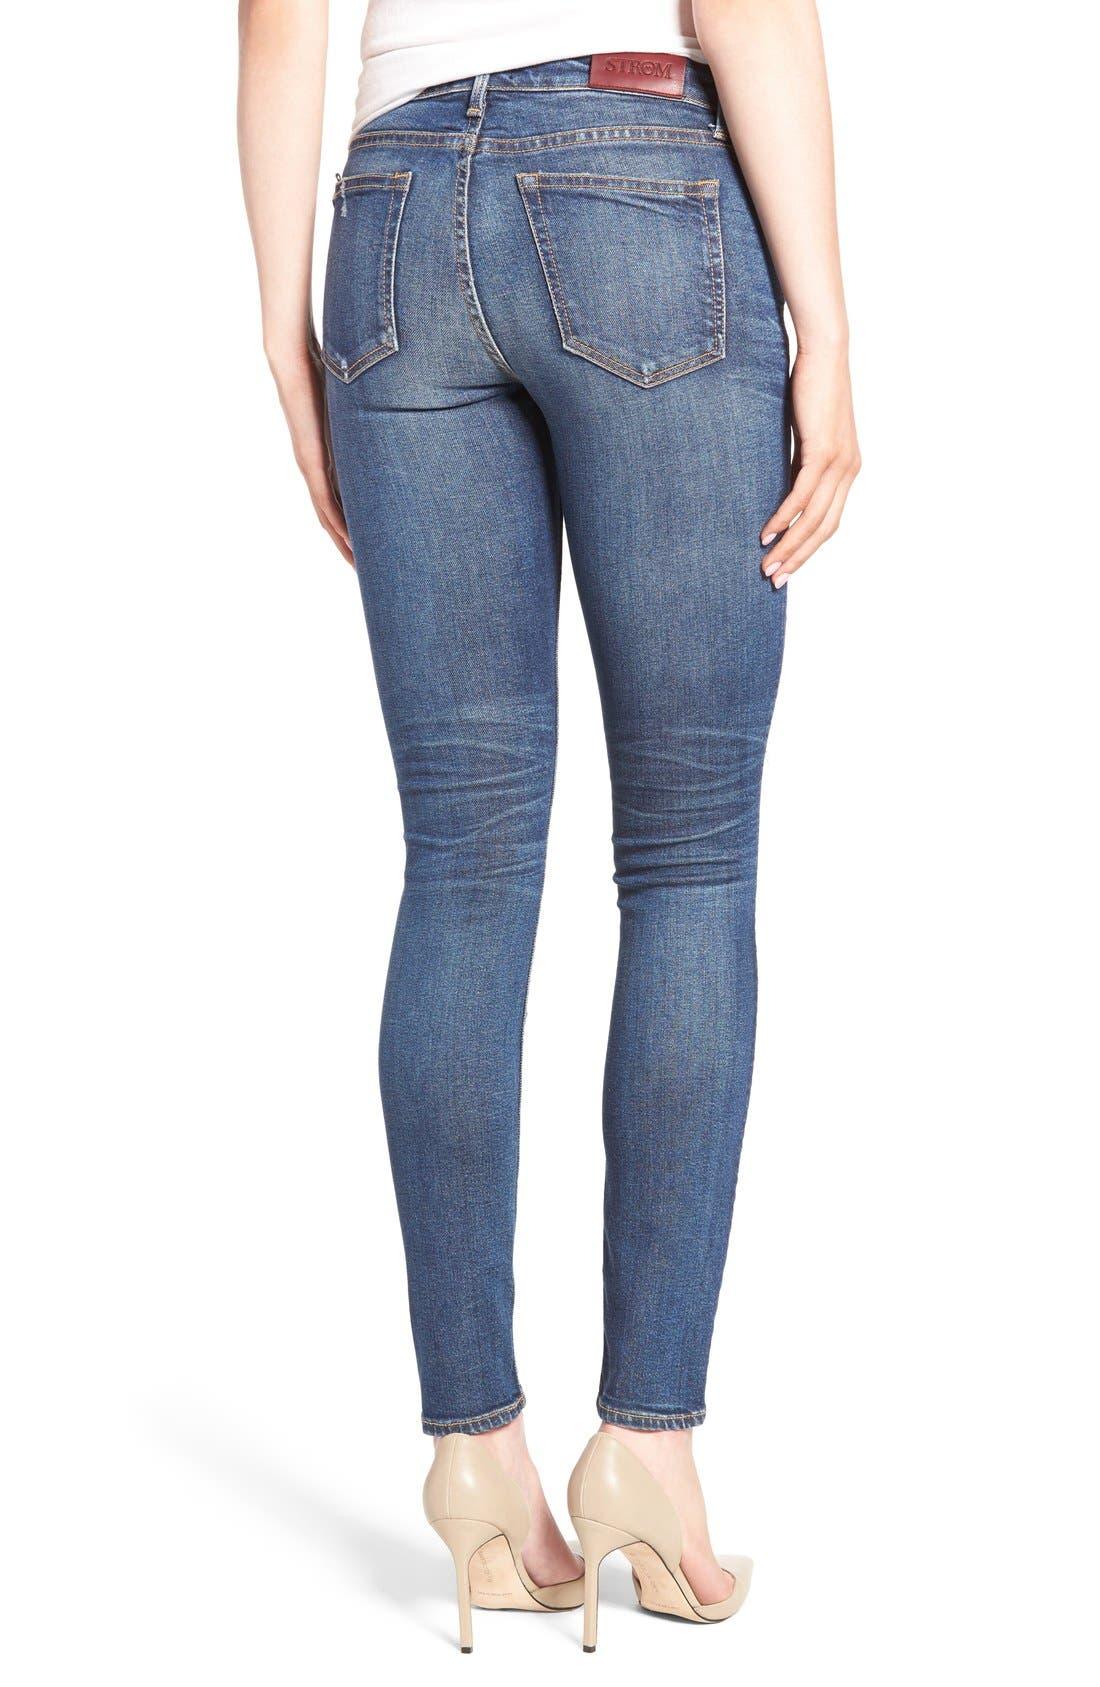 STROM,                             'Tio' Ankle Skinny Jeans,                             Alternate thumbnail 2, color,                             420